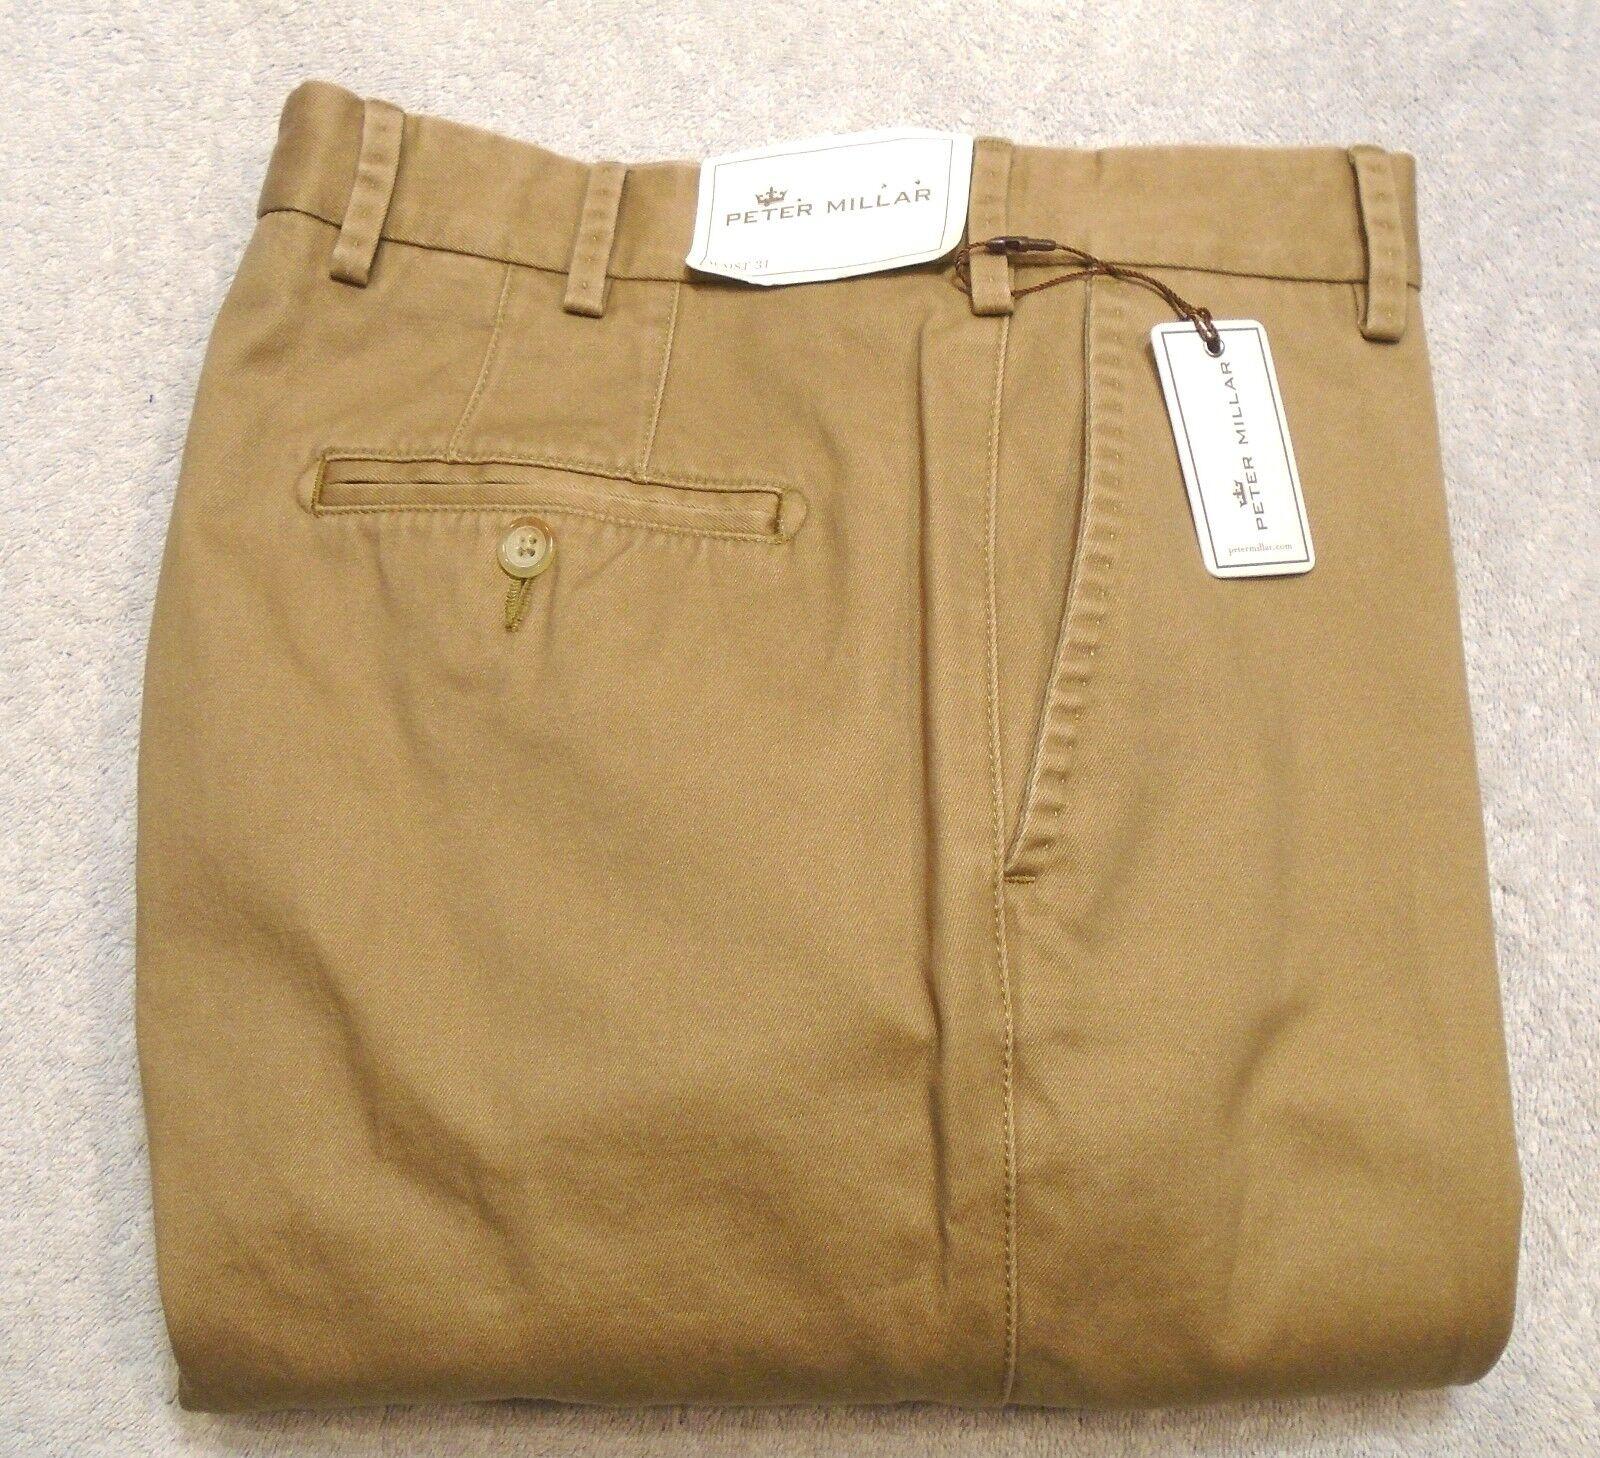 Peter Millar Raleigh Washed Twill Pima Cotton Khaki Pants NWT  31 x 36